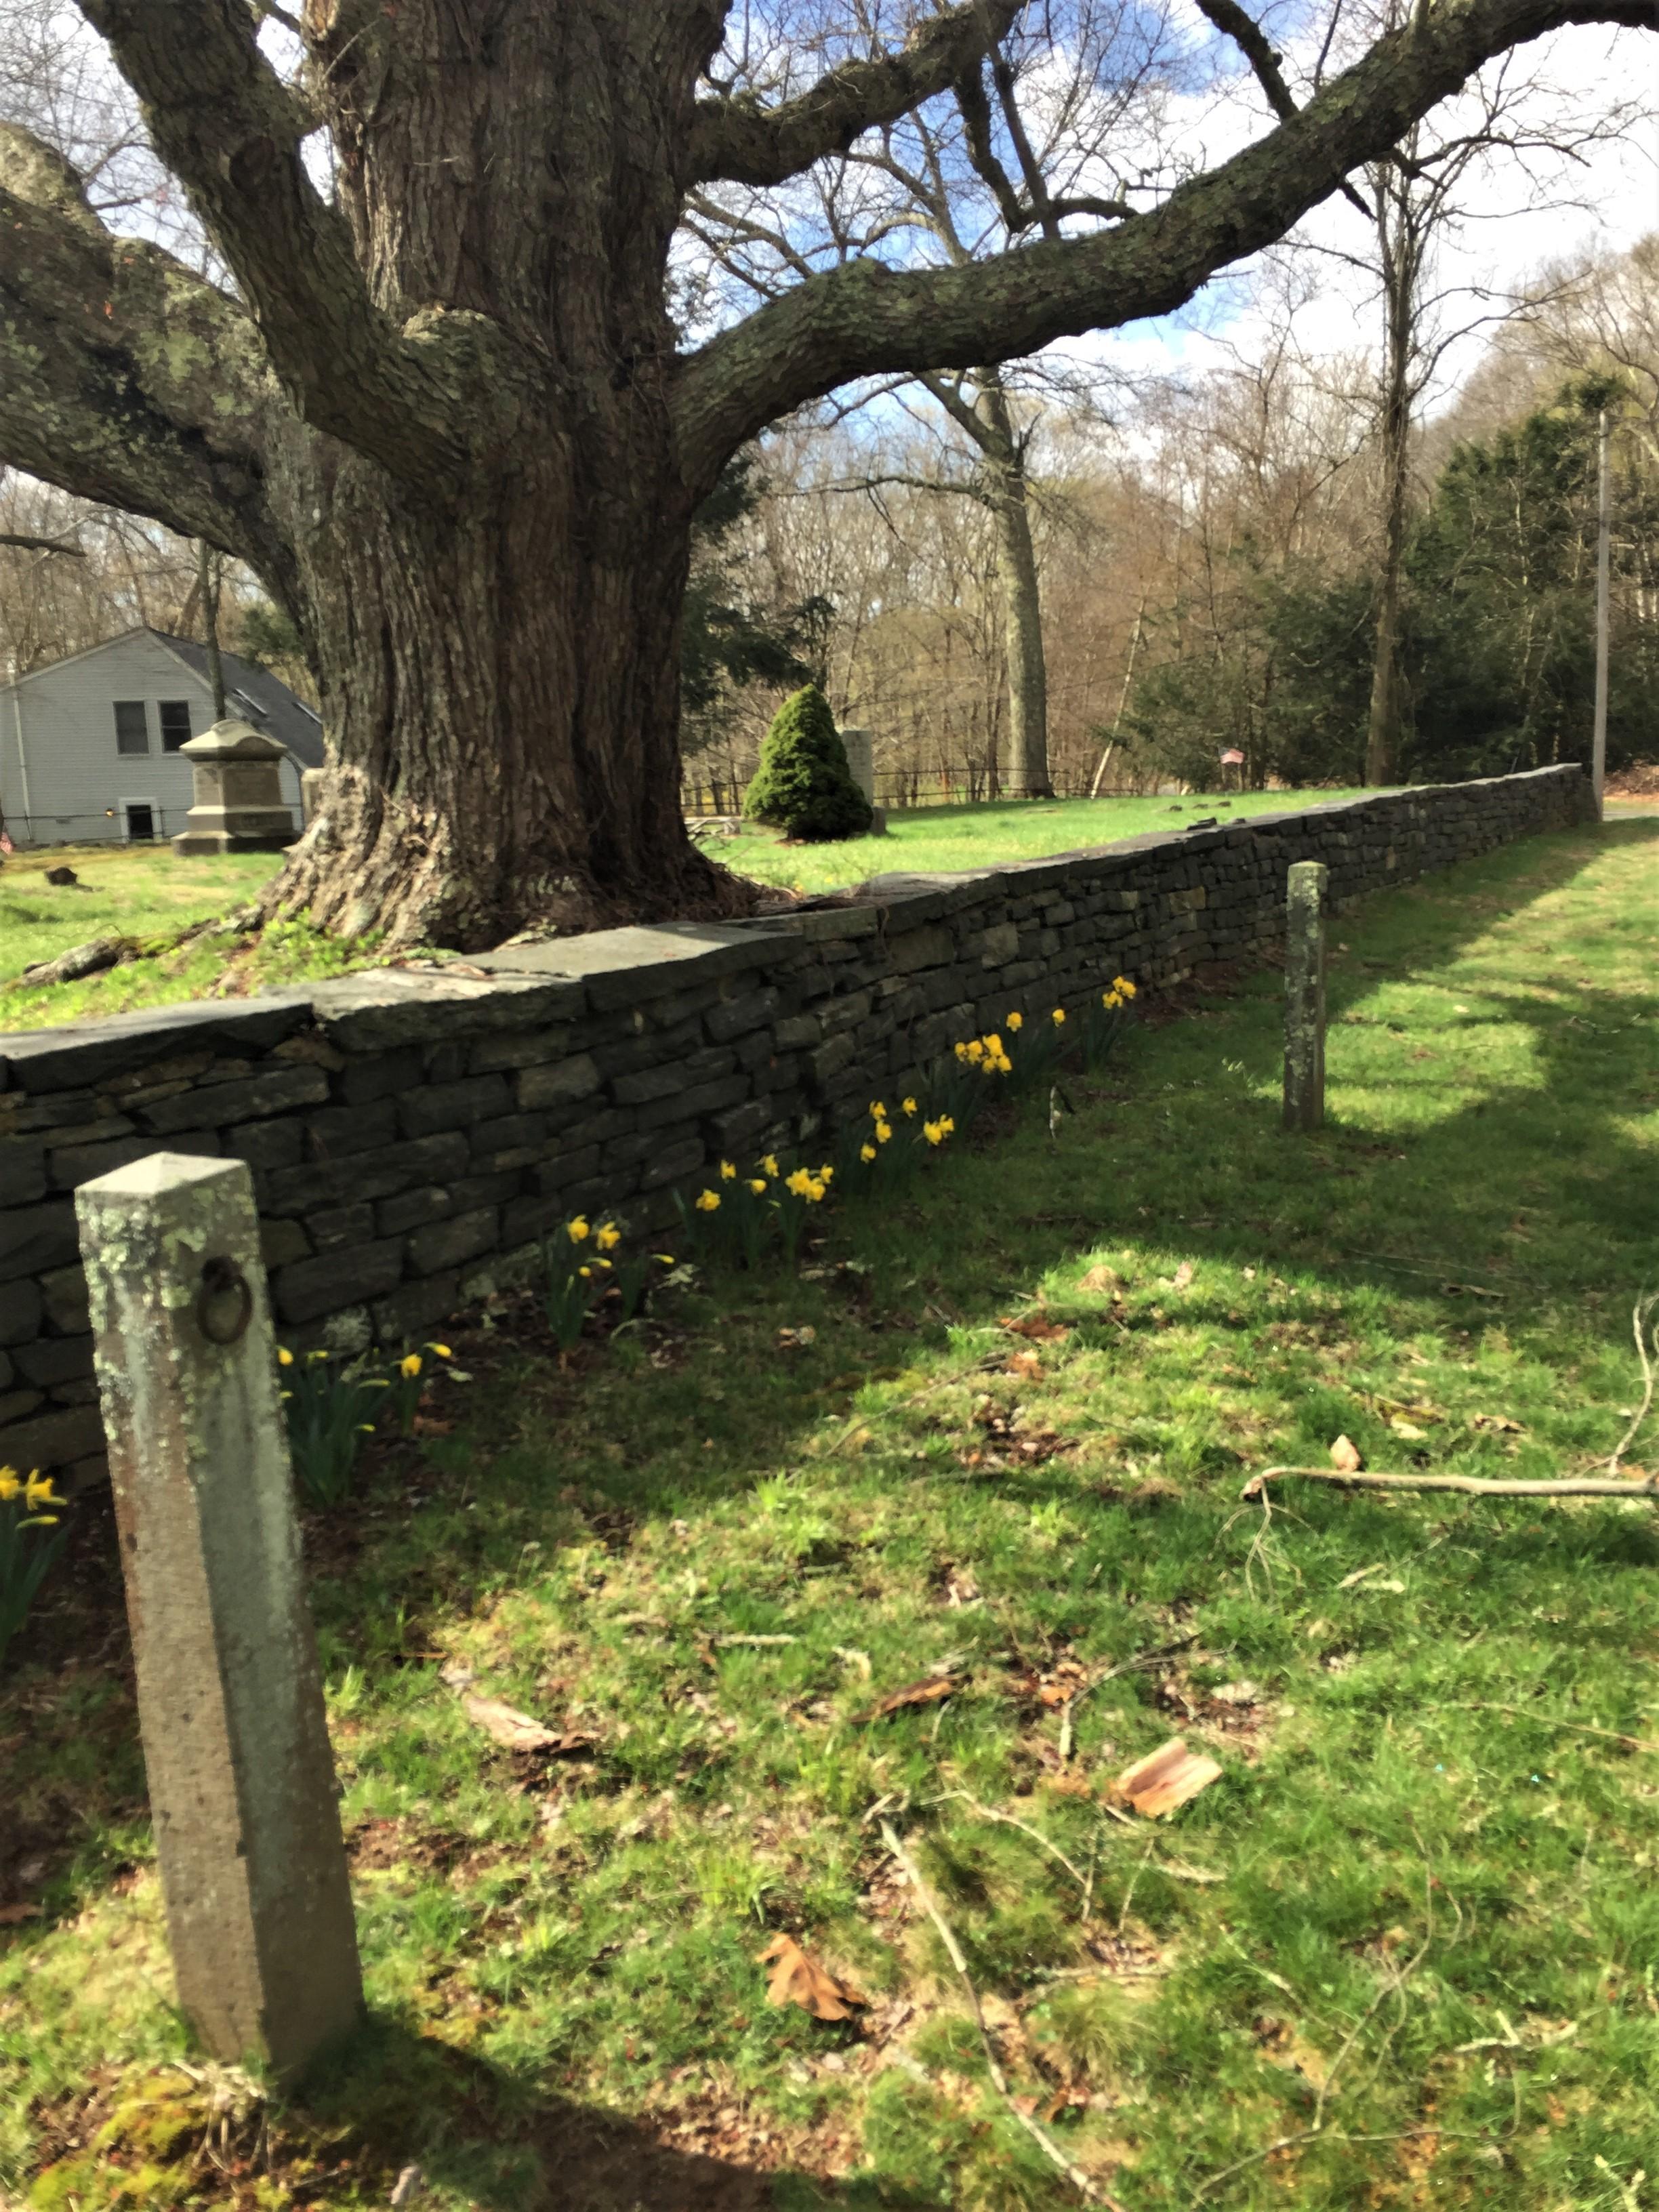 IMG_2146 Cemetery Bob W 2019